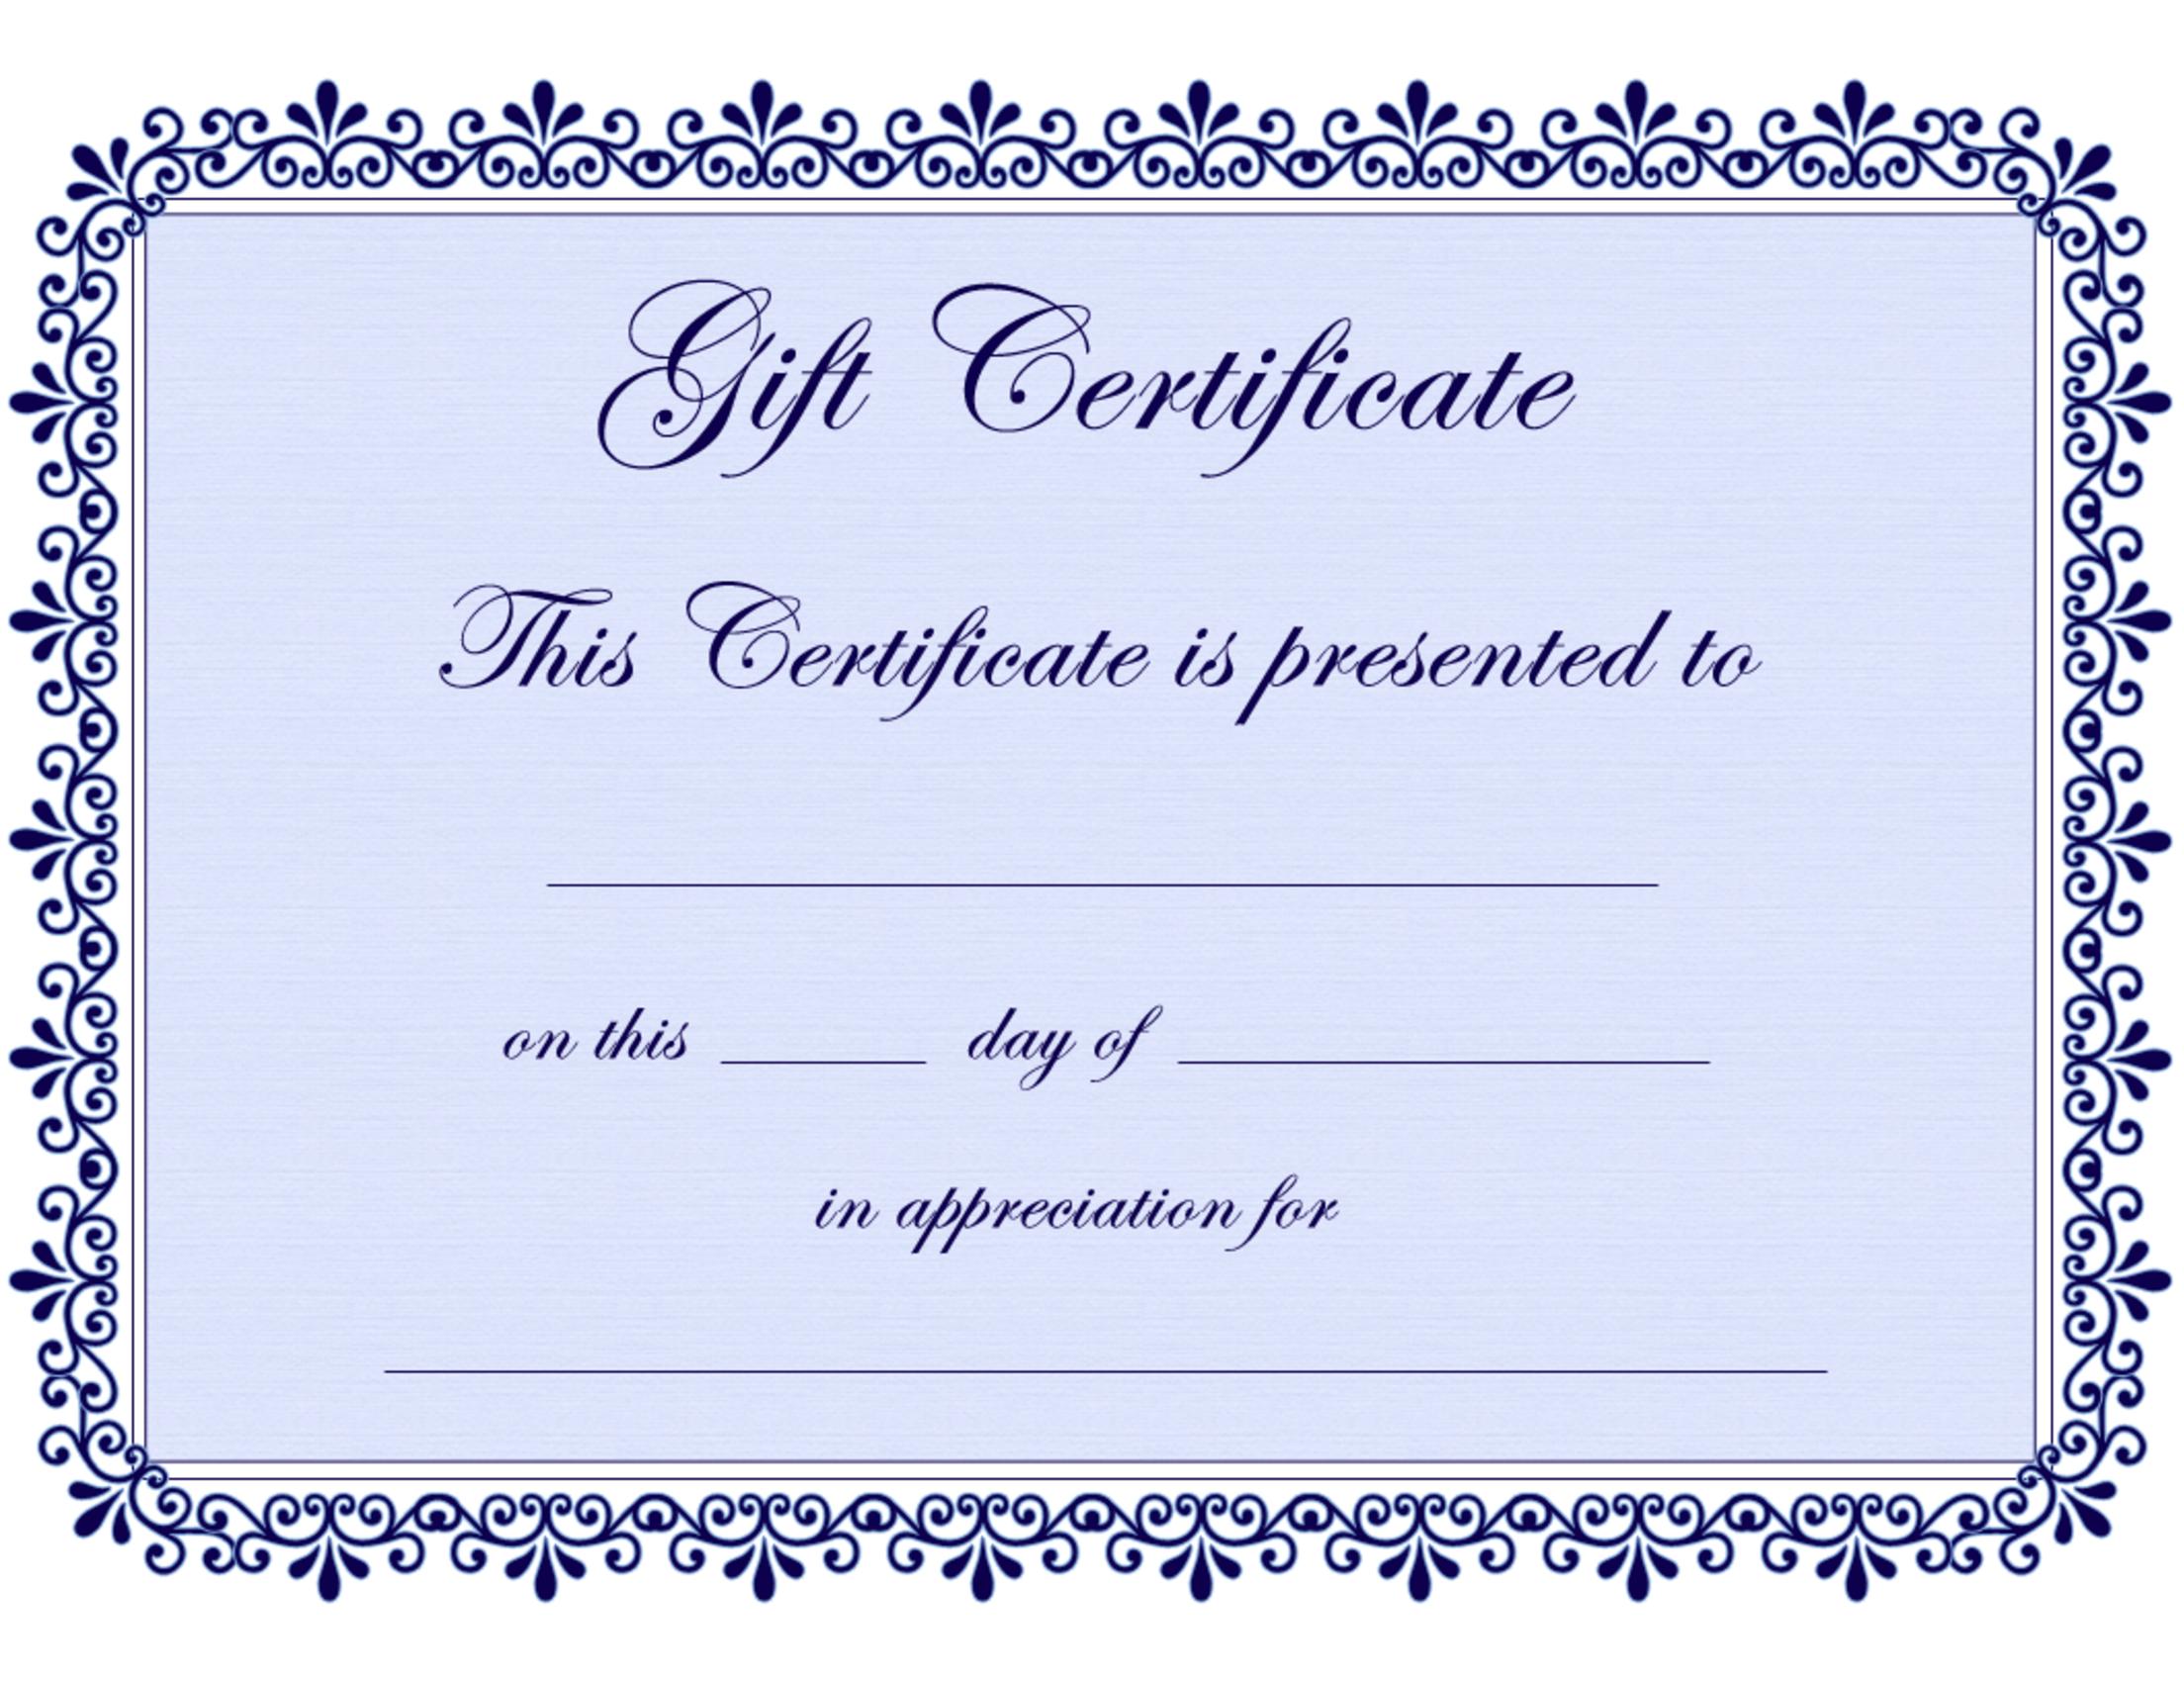 Fillable Gift Certificate – Printable Editable Blank